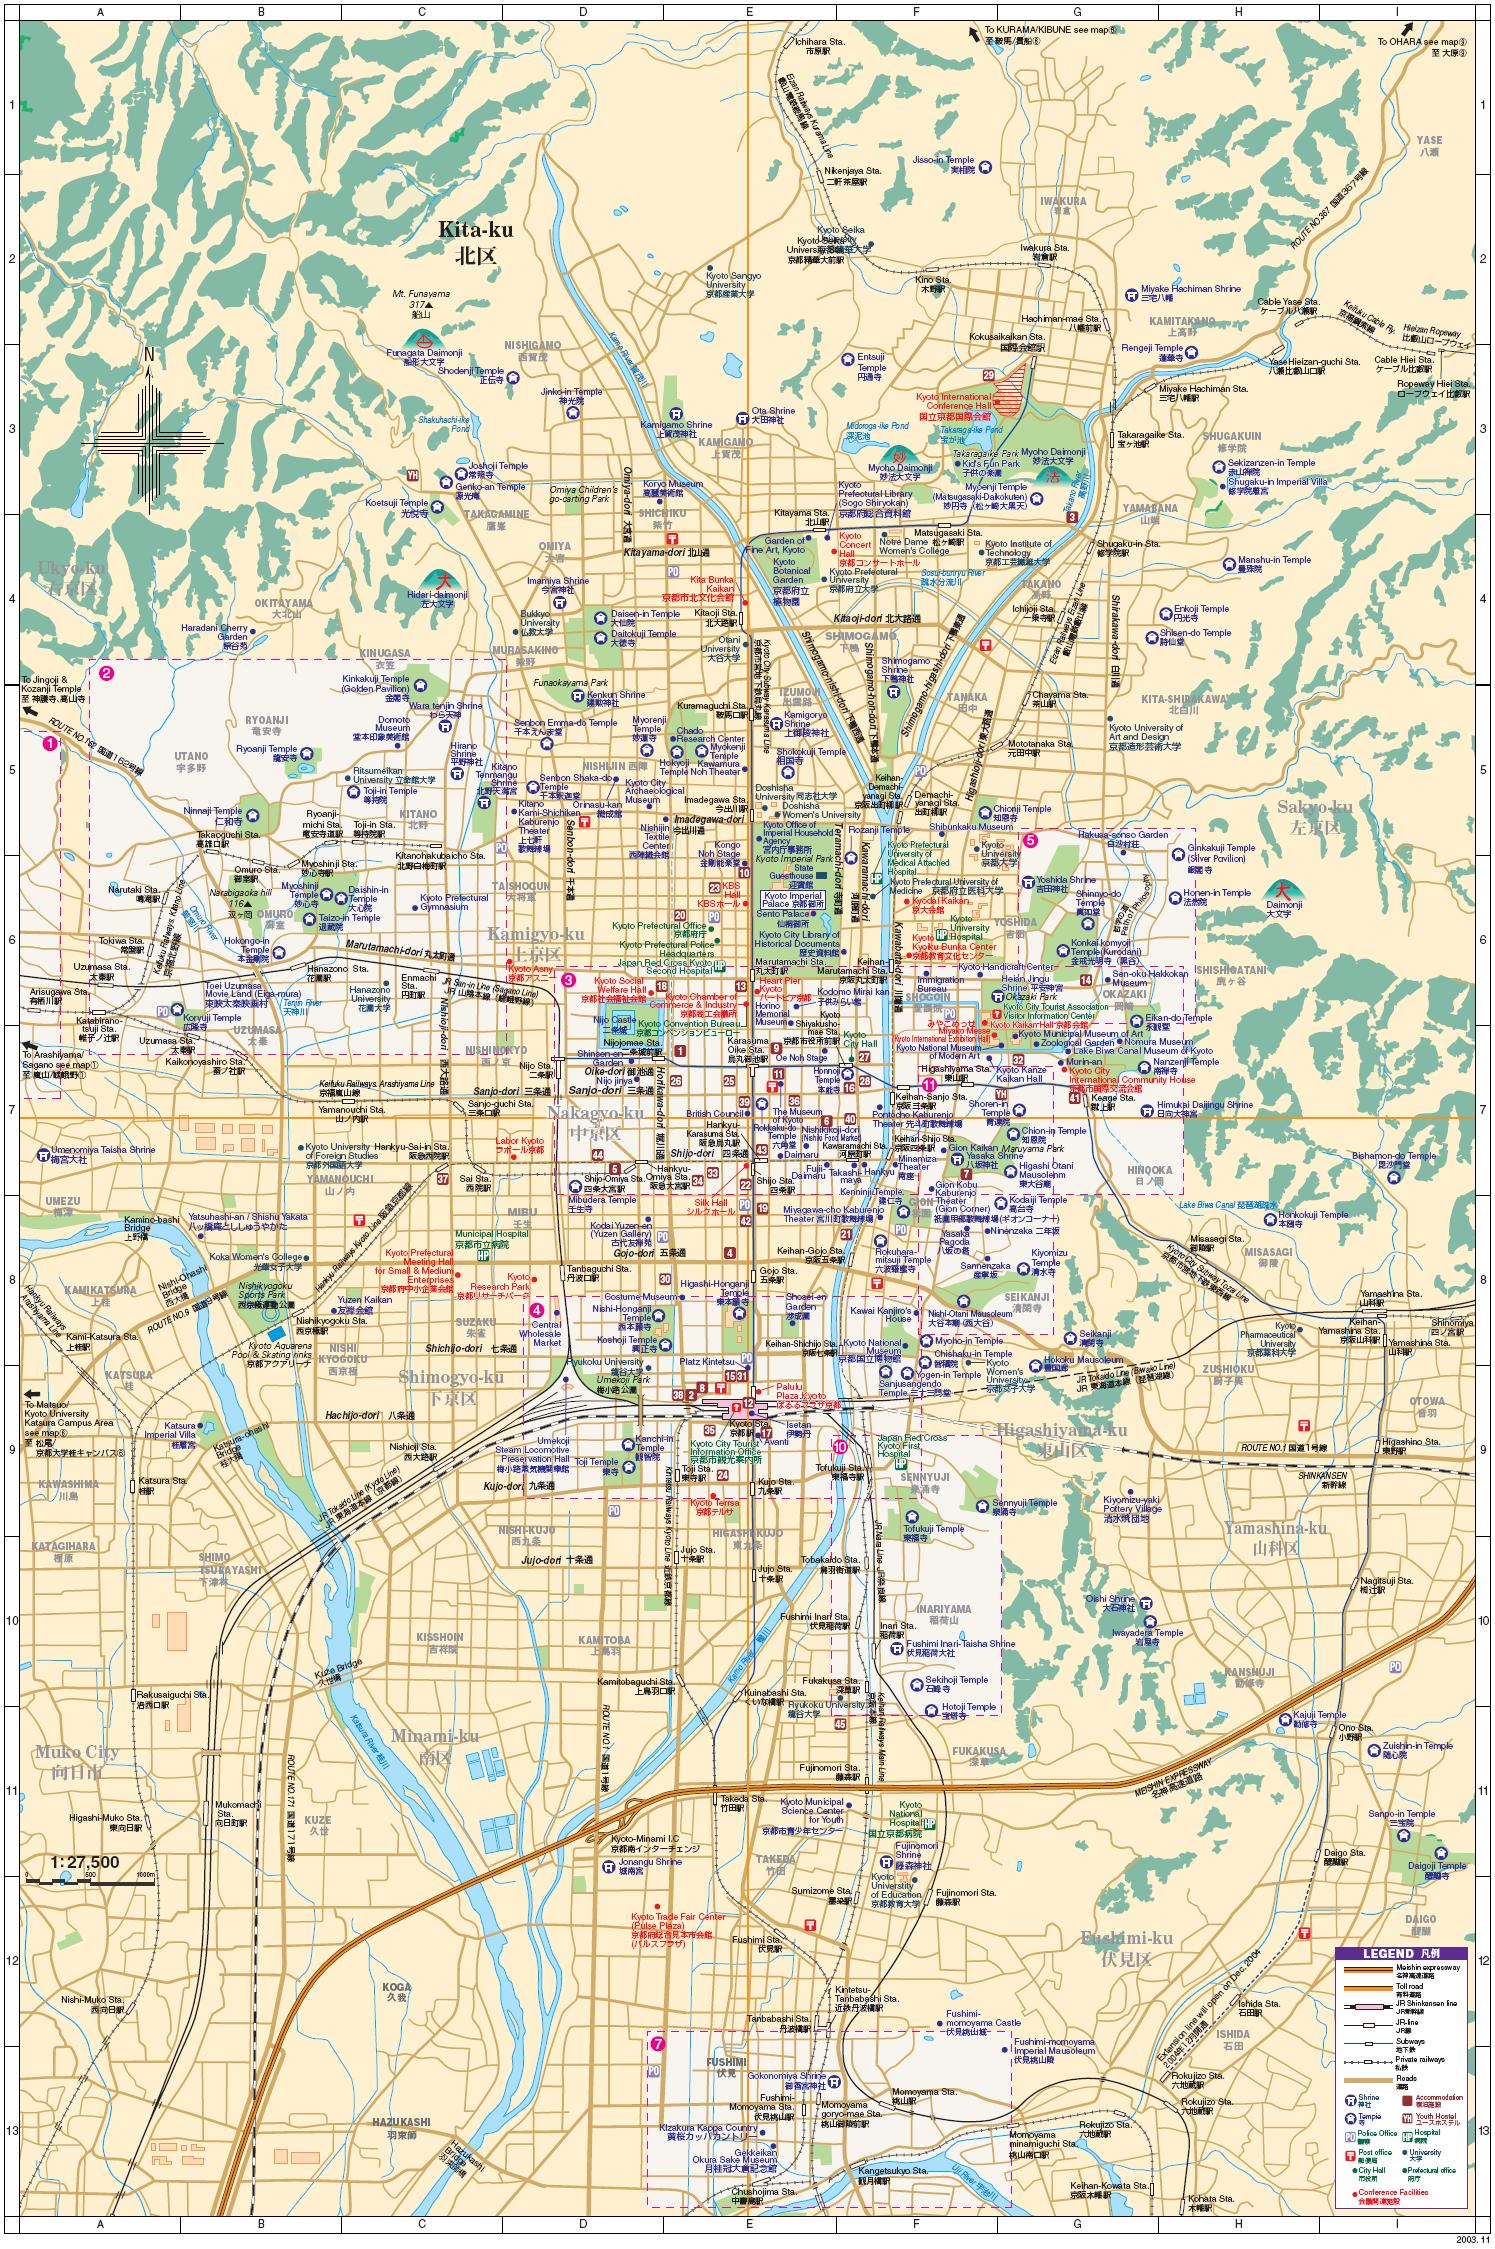 Kyoto Tourist Map Kyoto Japan mappery